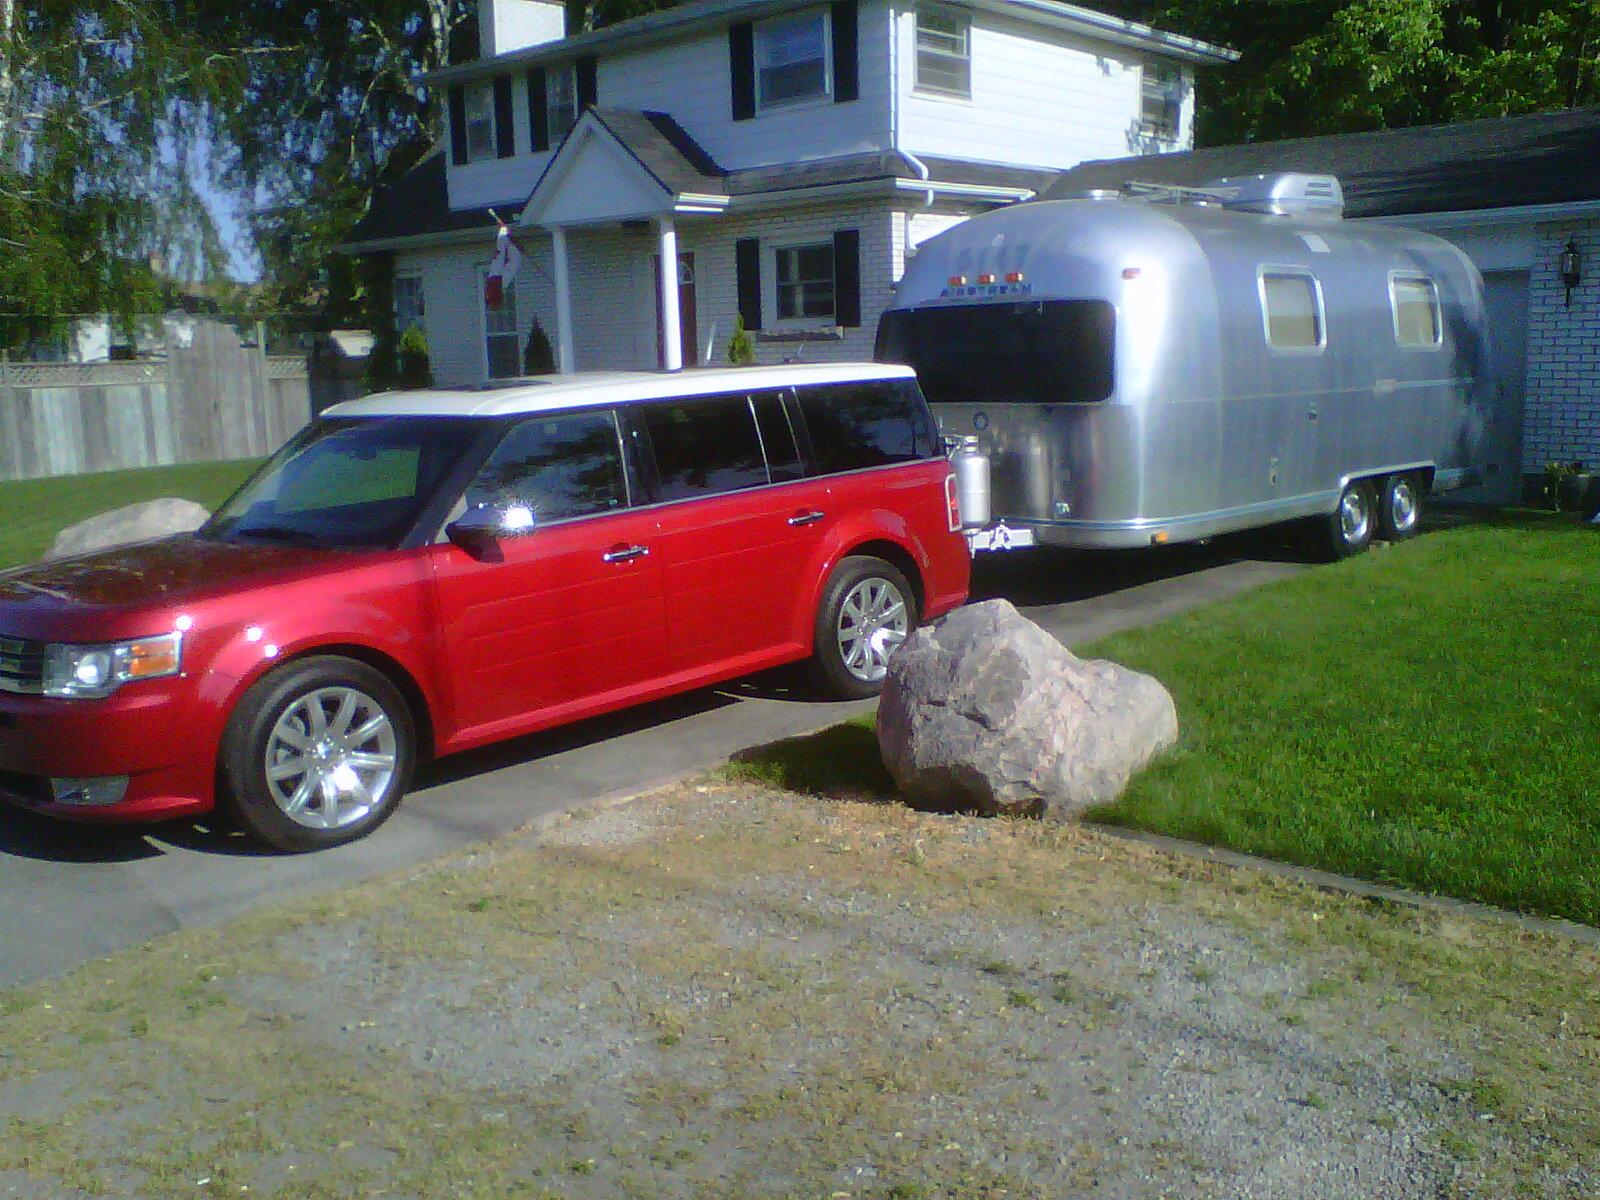 Click image for larger version  Name:Niagara-on-the-Lake-20120516-00177.jpg Views:52 Size:498.8 KB ID:166341